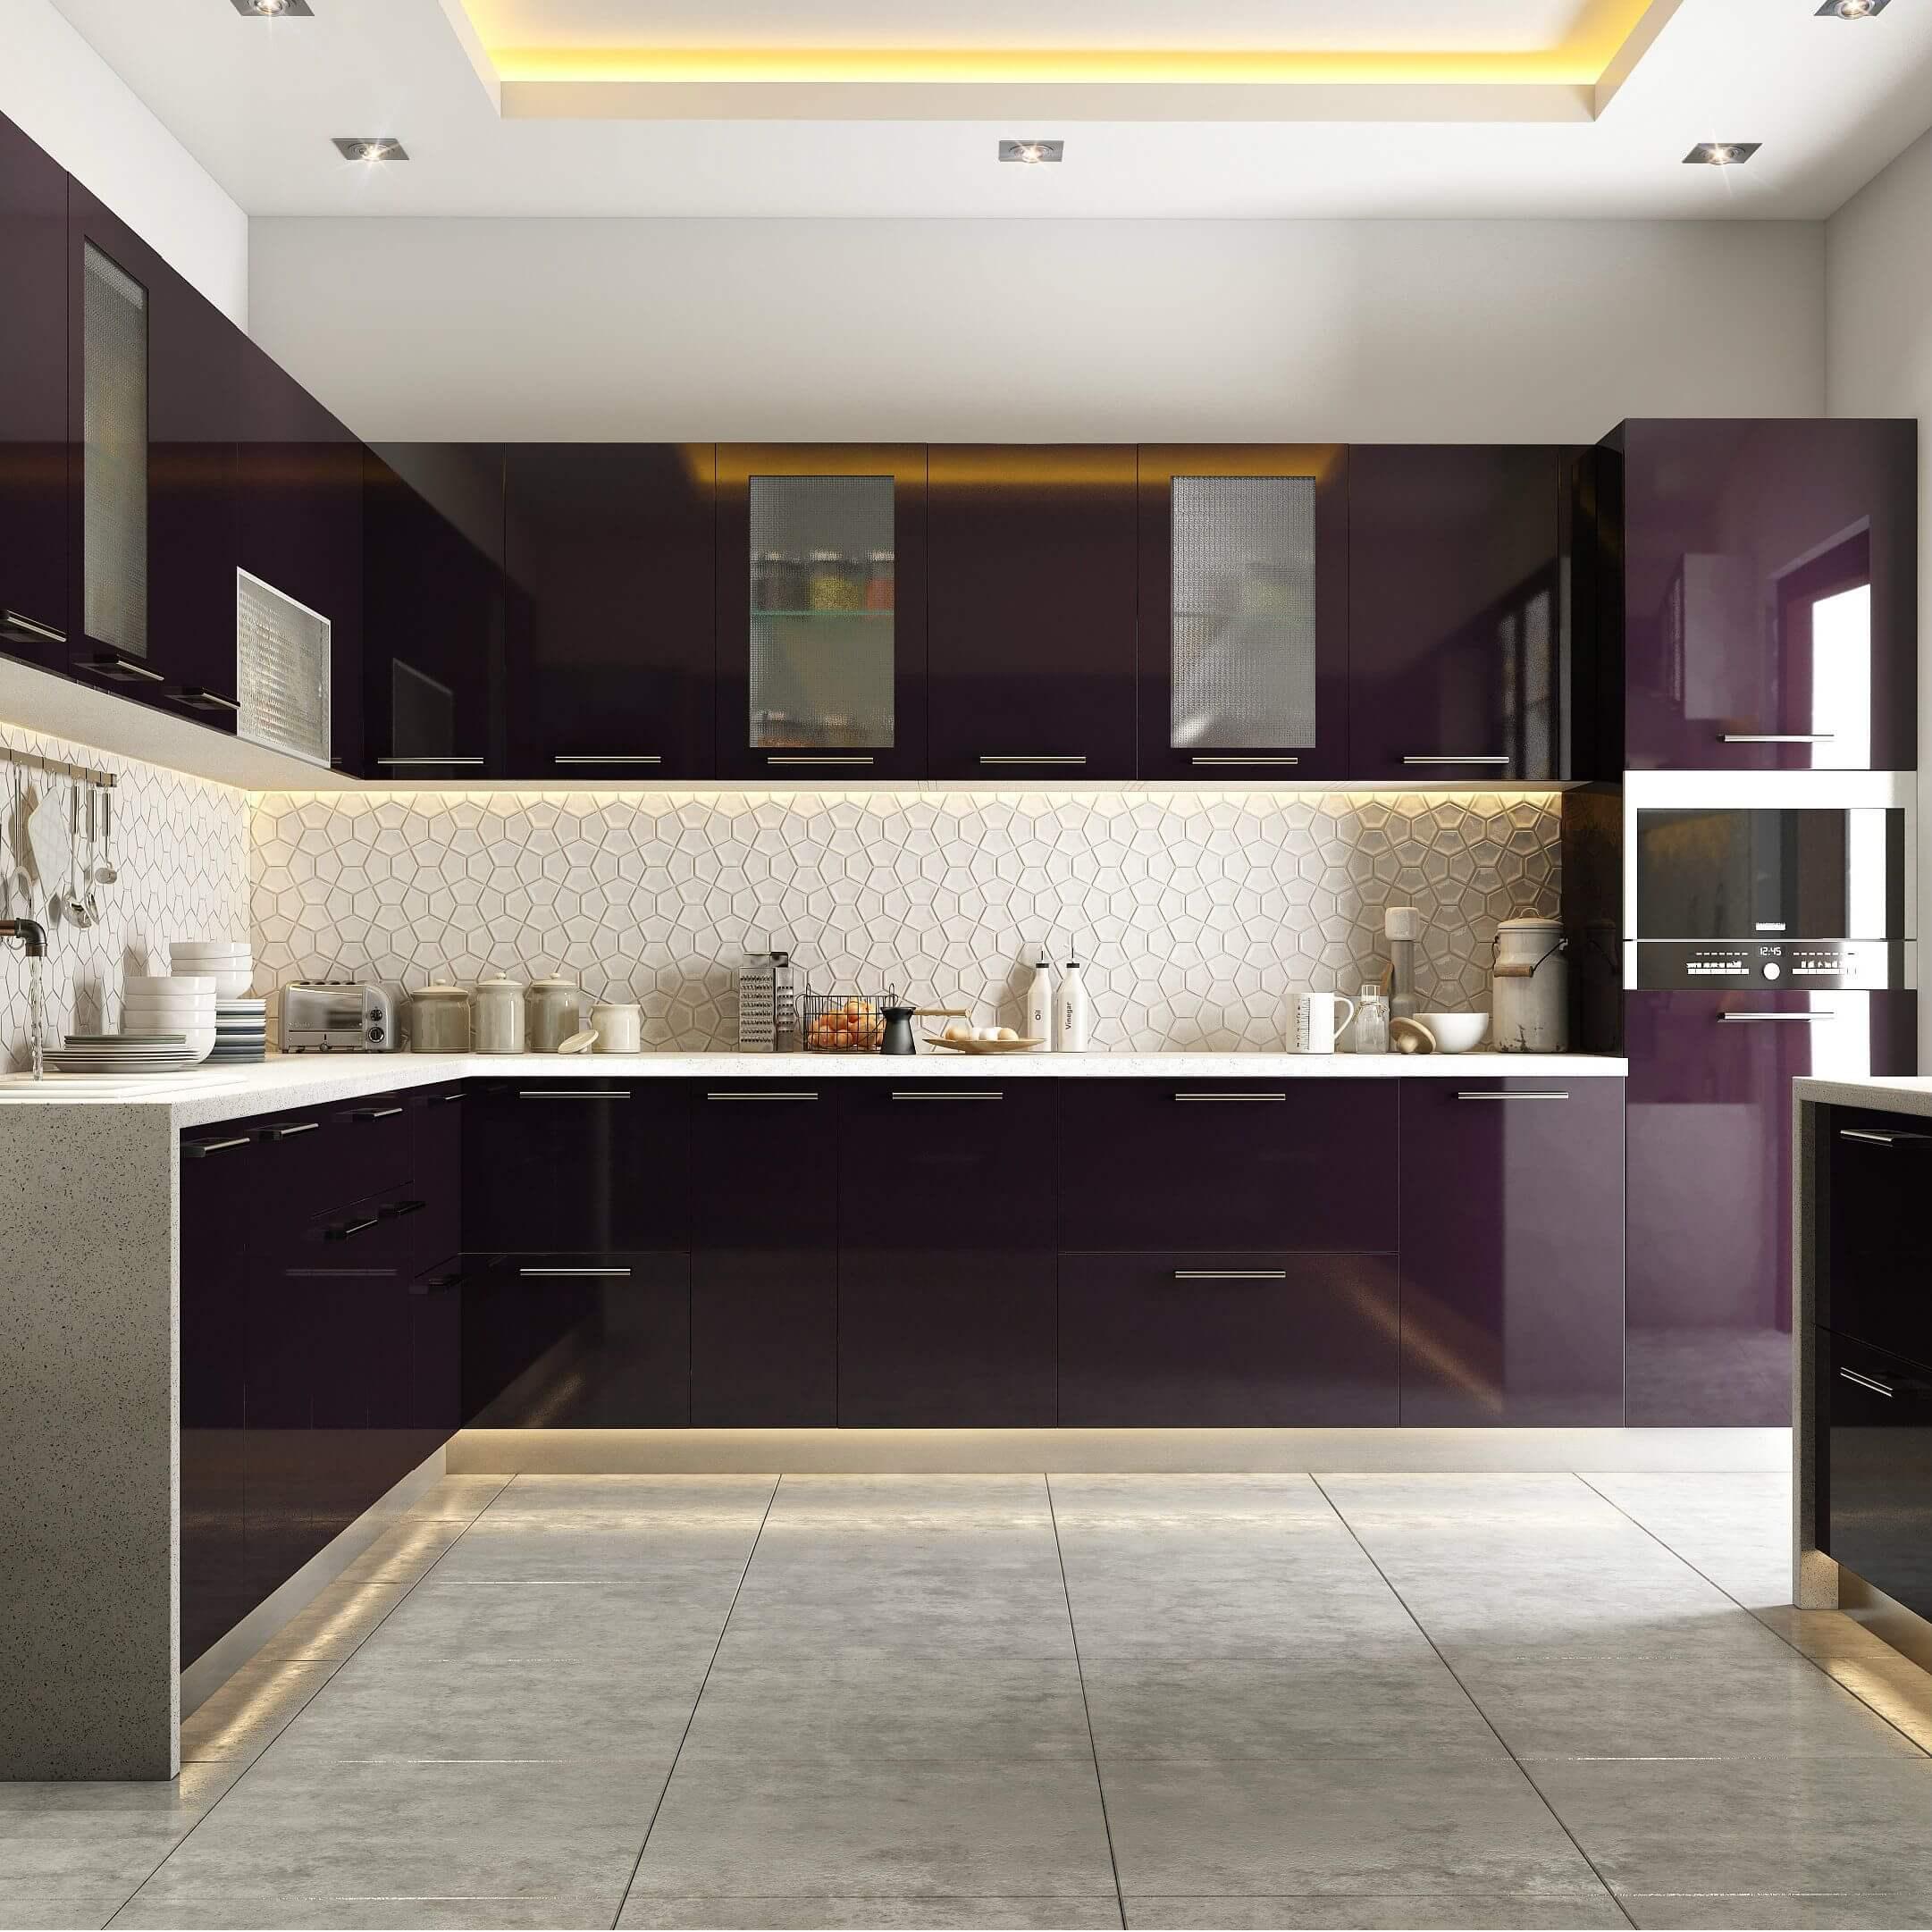 Modular Kitchen Design Ideas For Indian Homes on Kitchen Model Ideas  id=87303